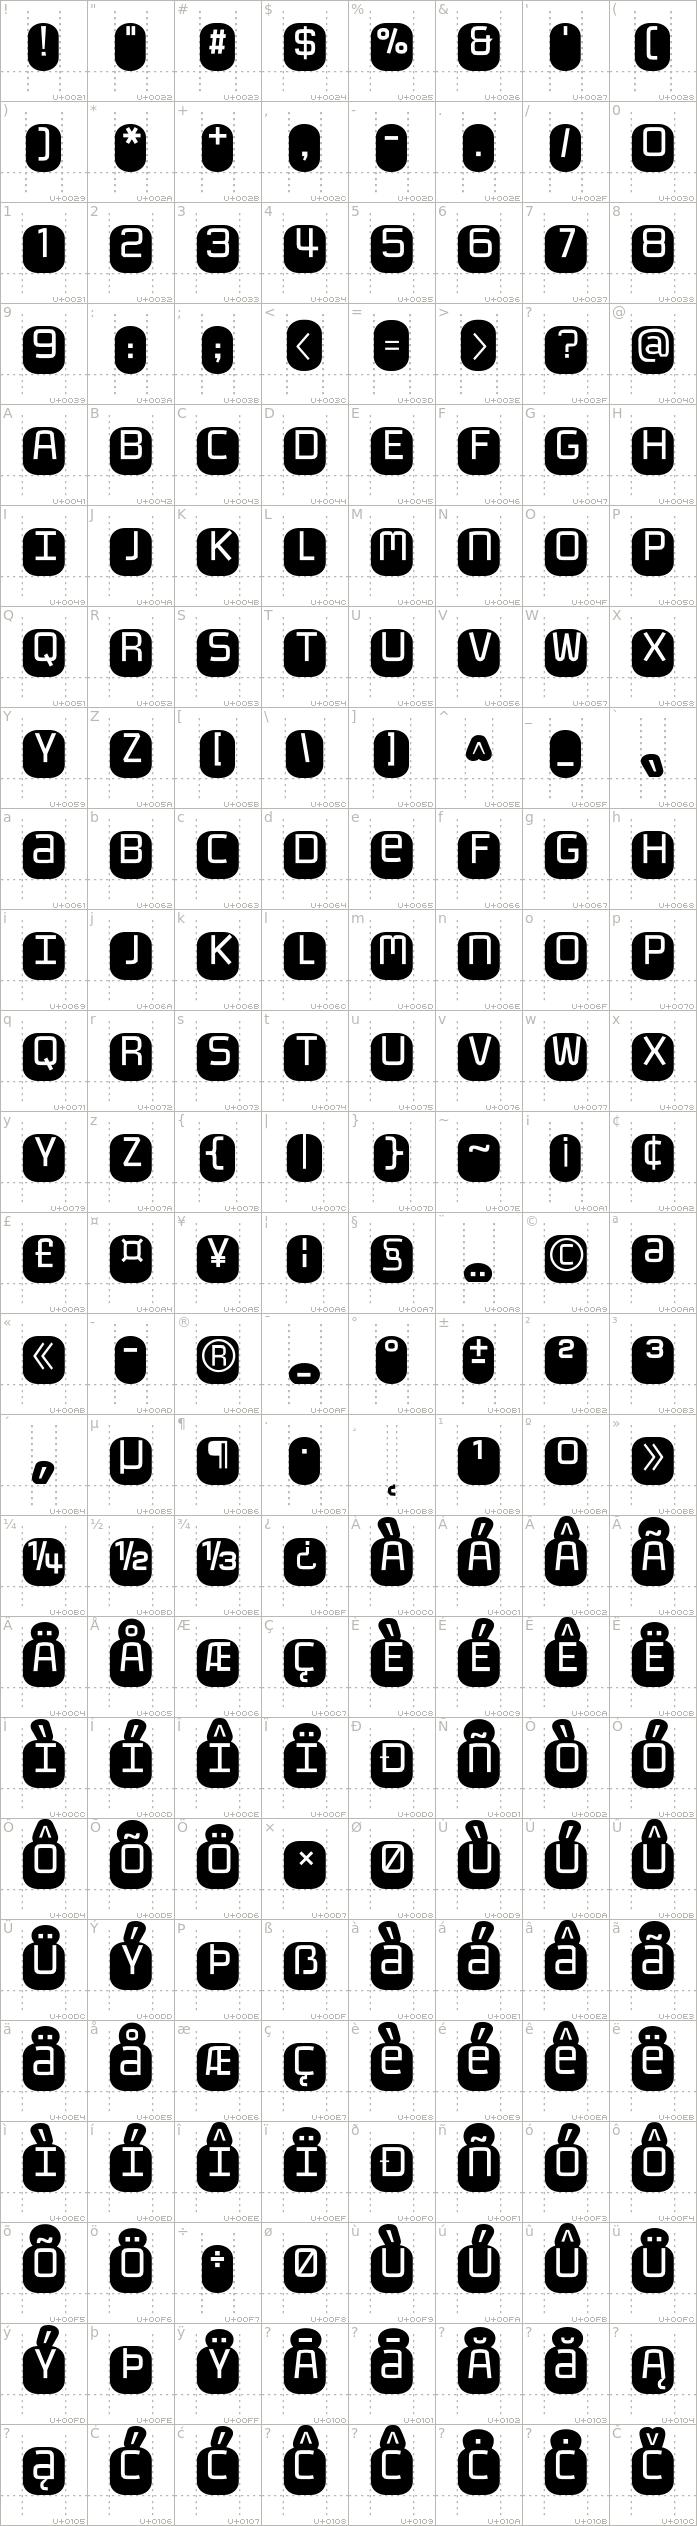 monofett.regular.character-map-1